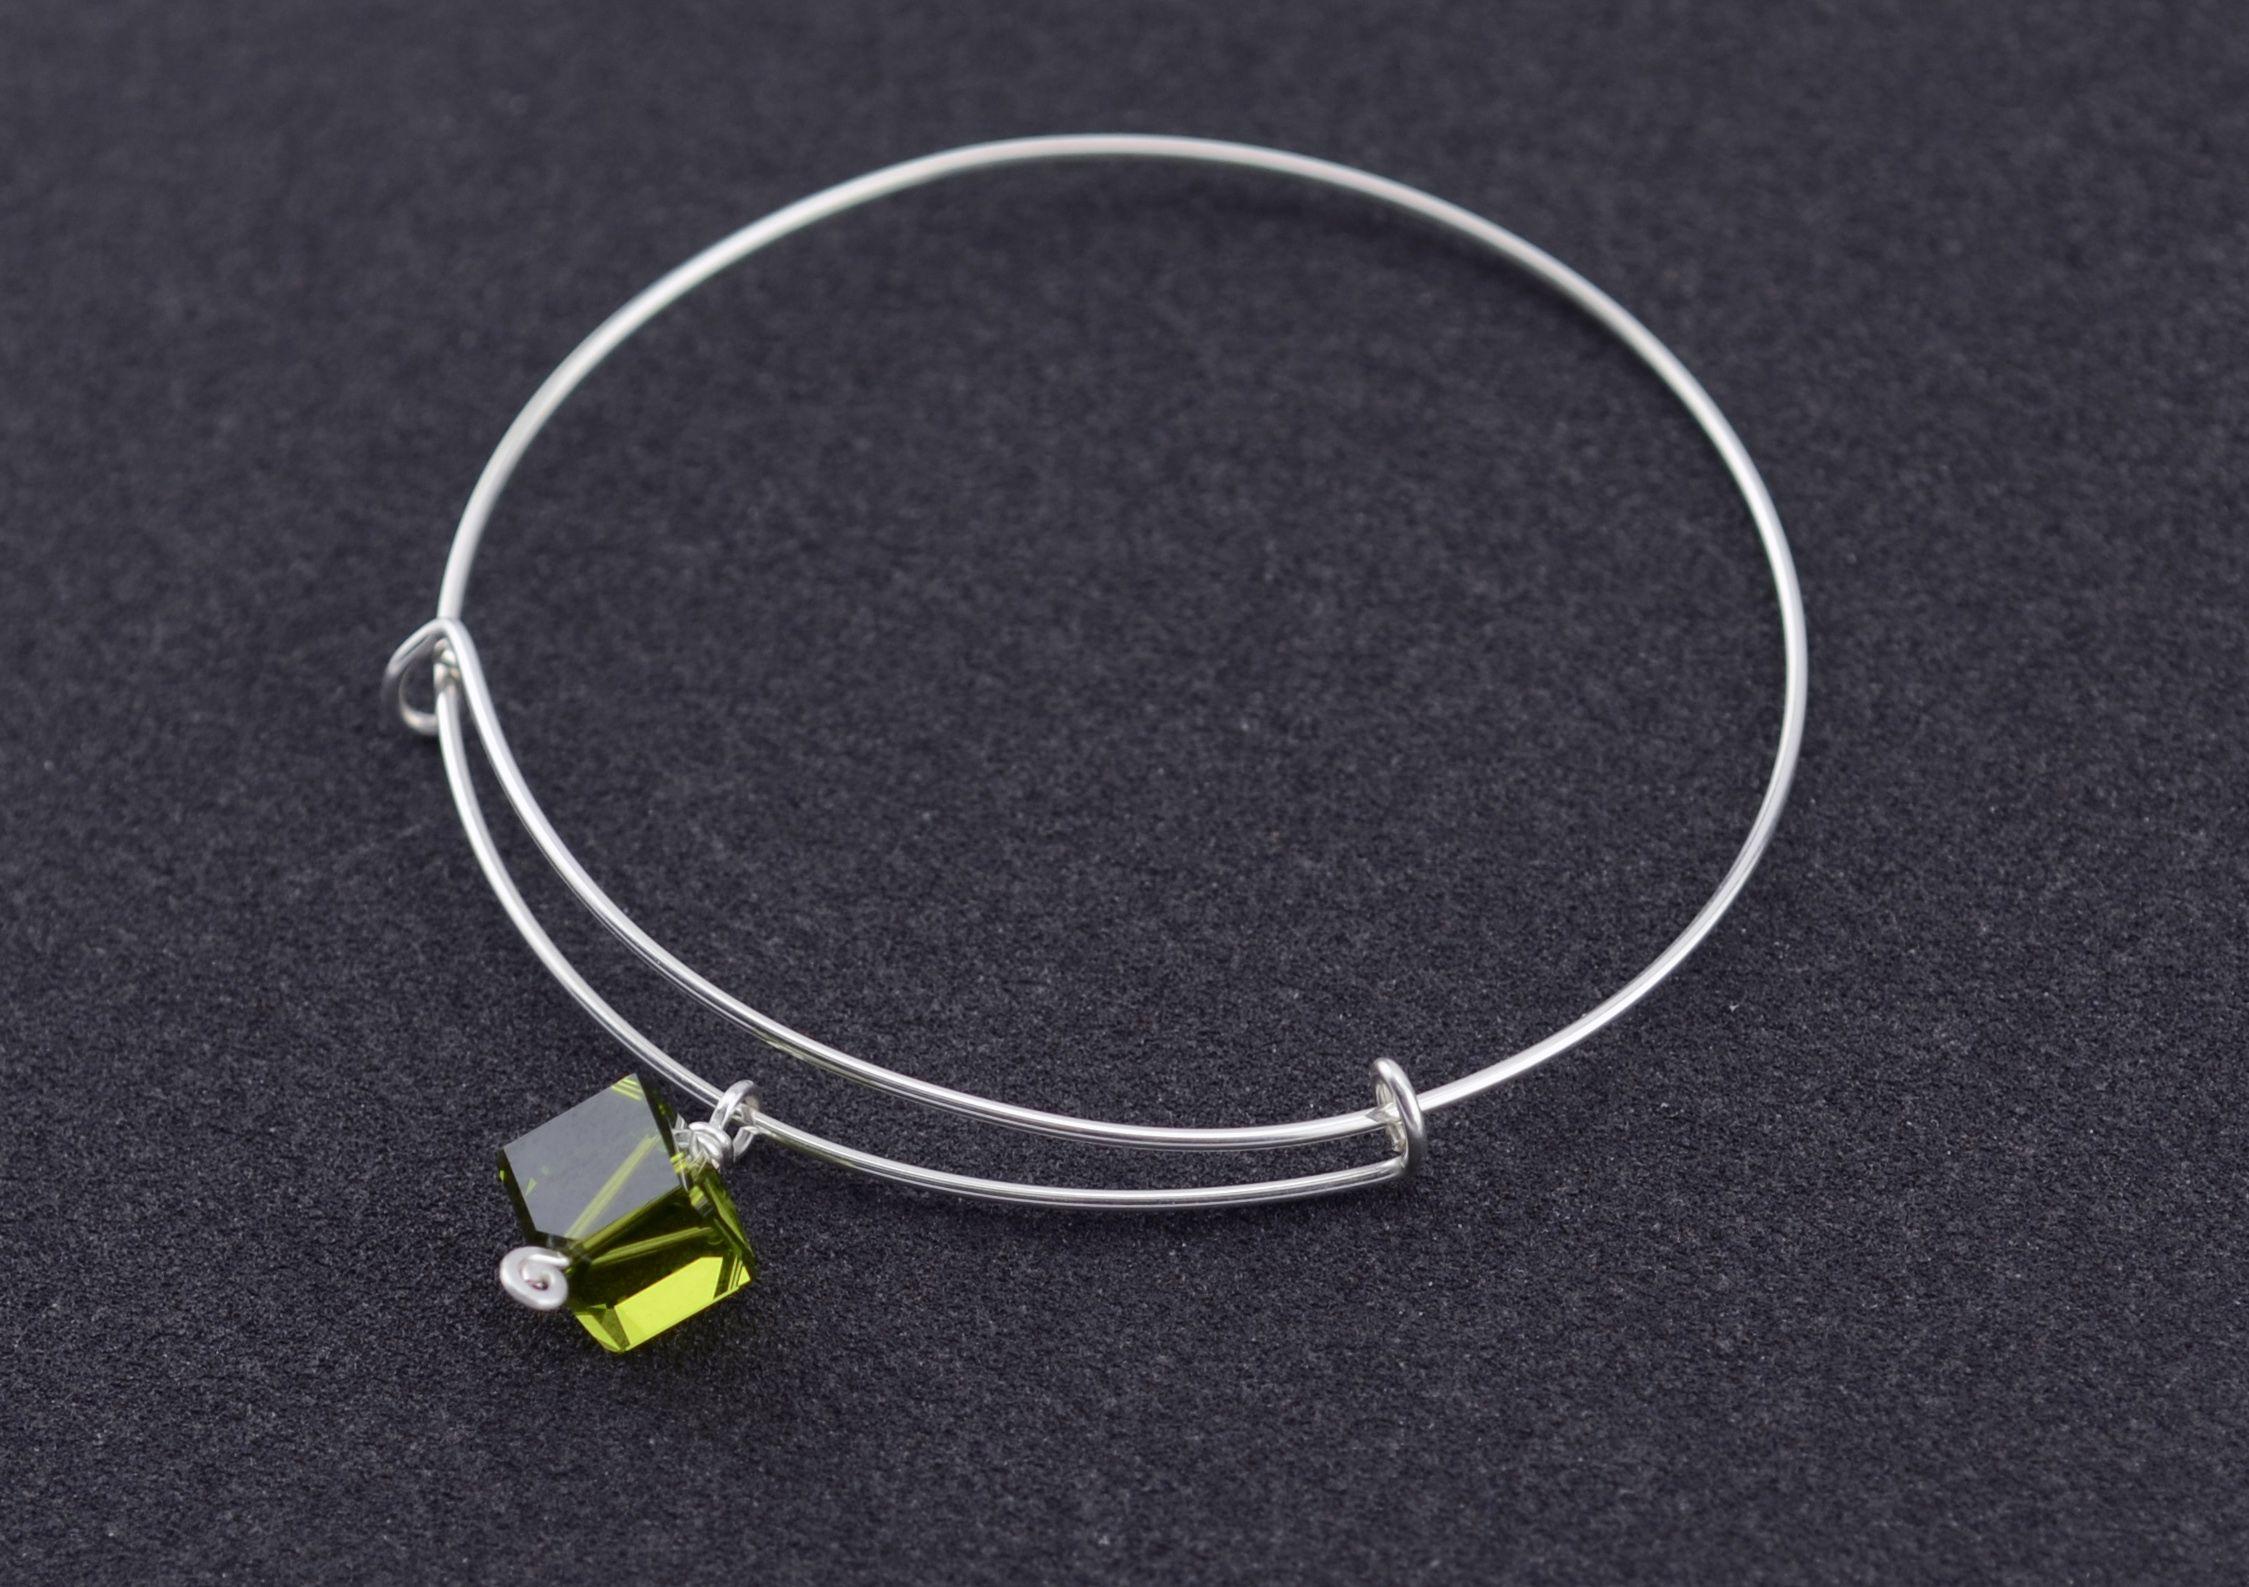 Learn to use a 3D Bracelet Jig to make an adjustable bangle bracelet ...